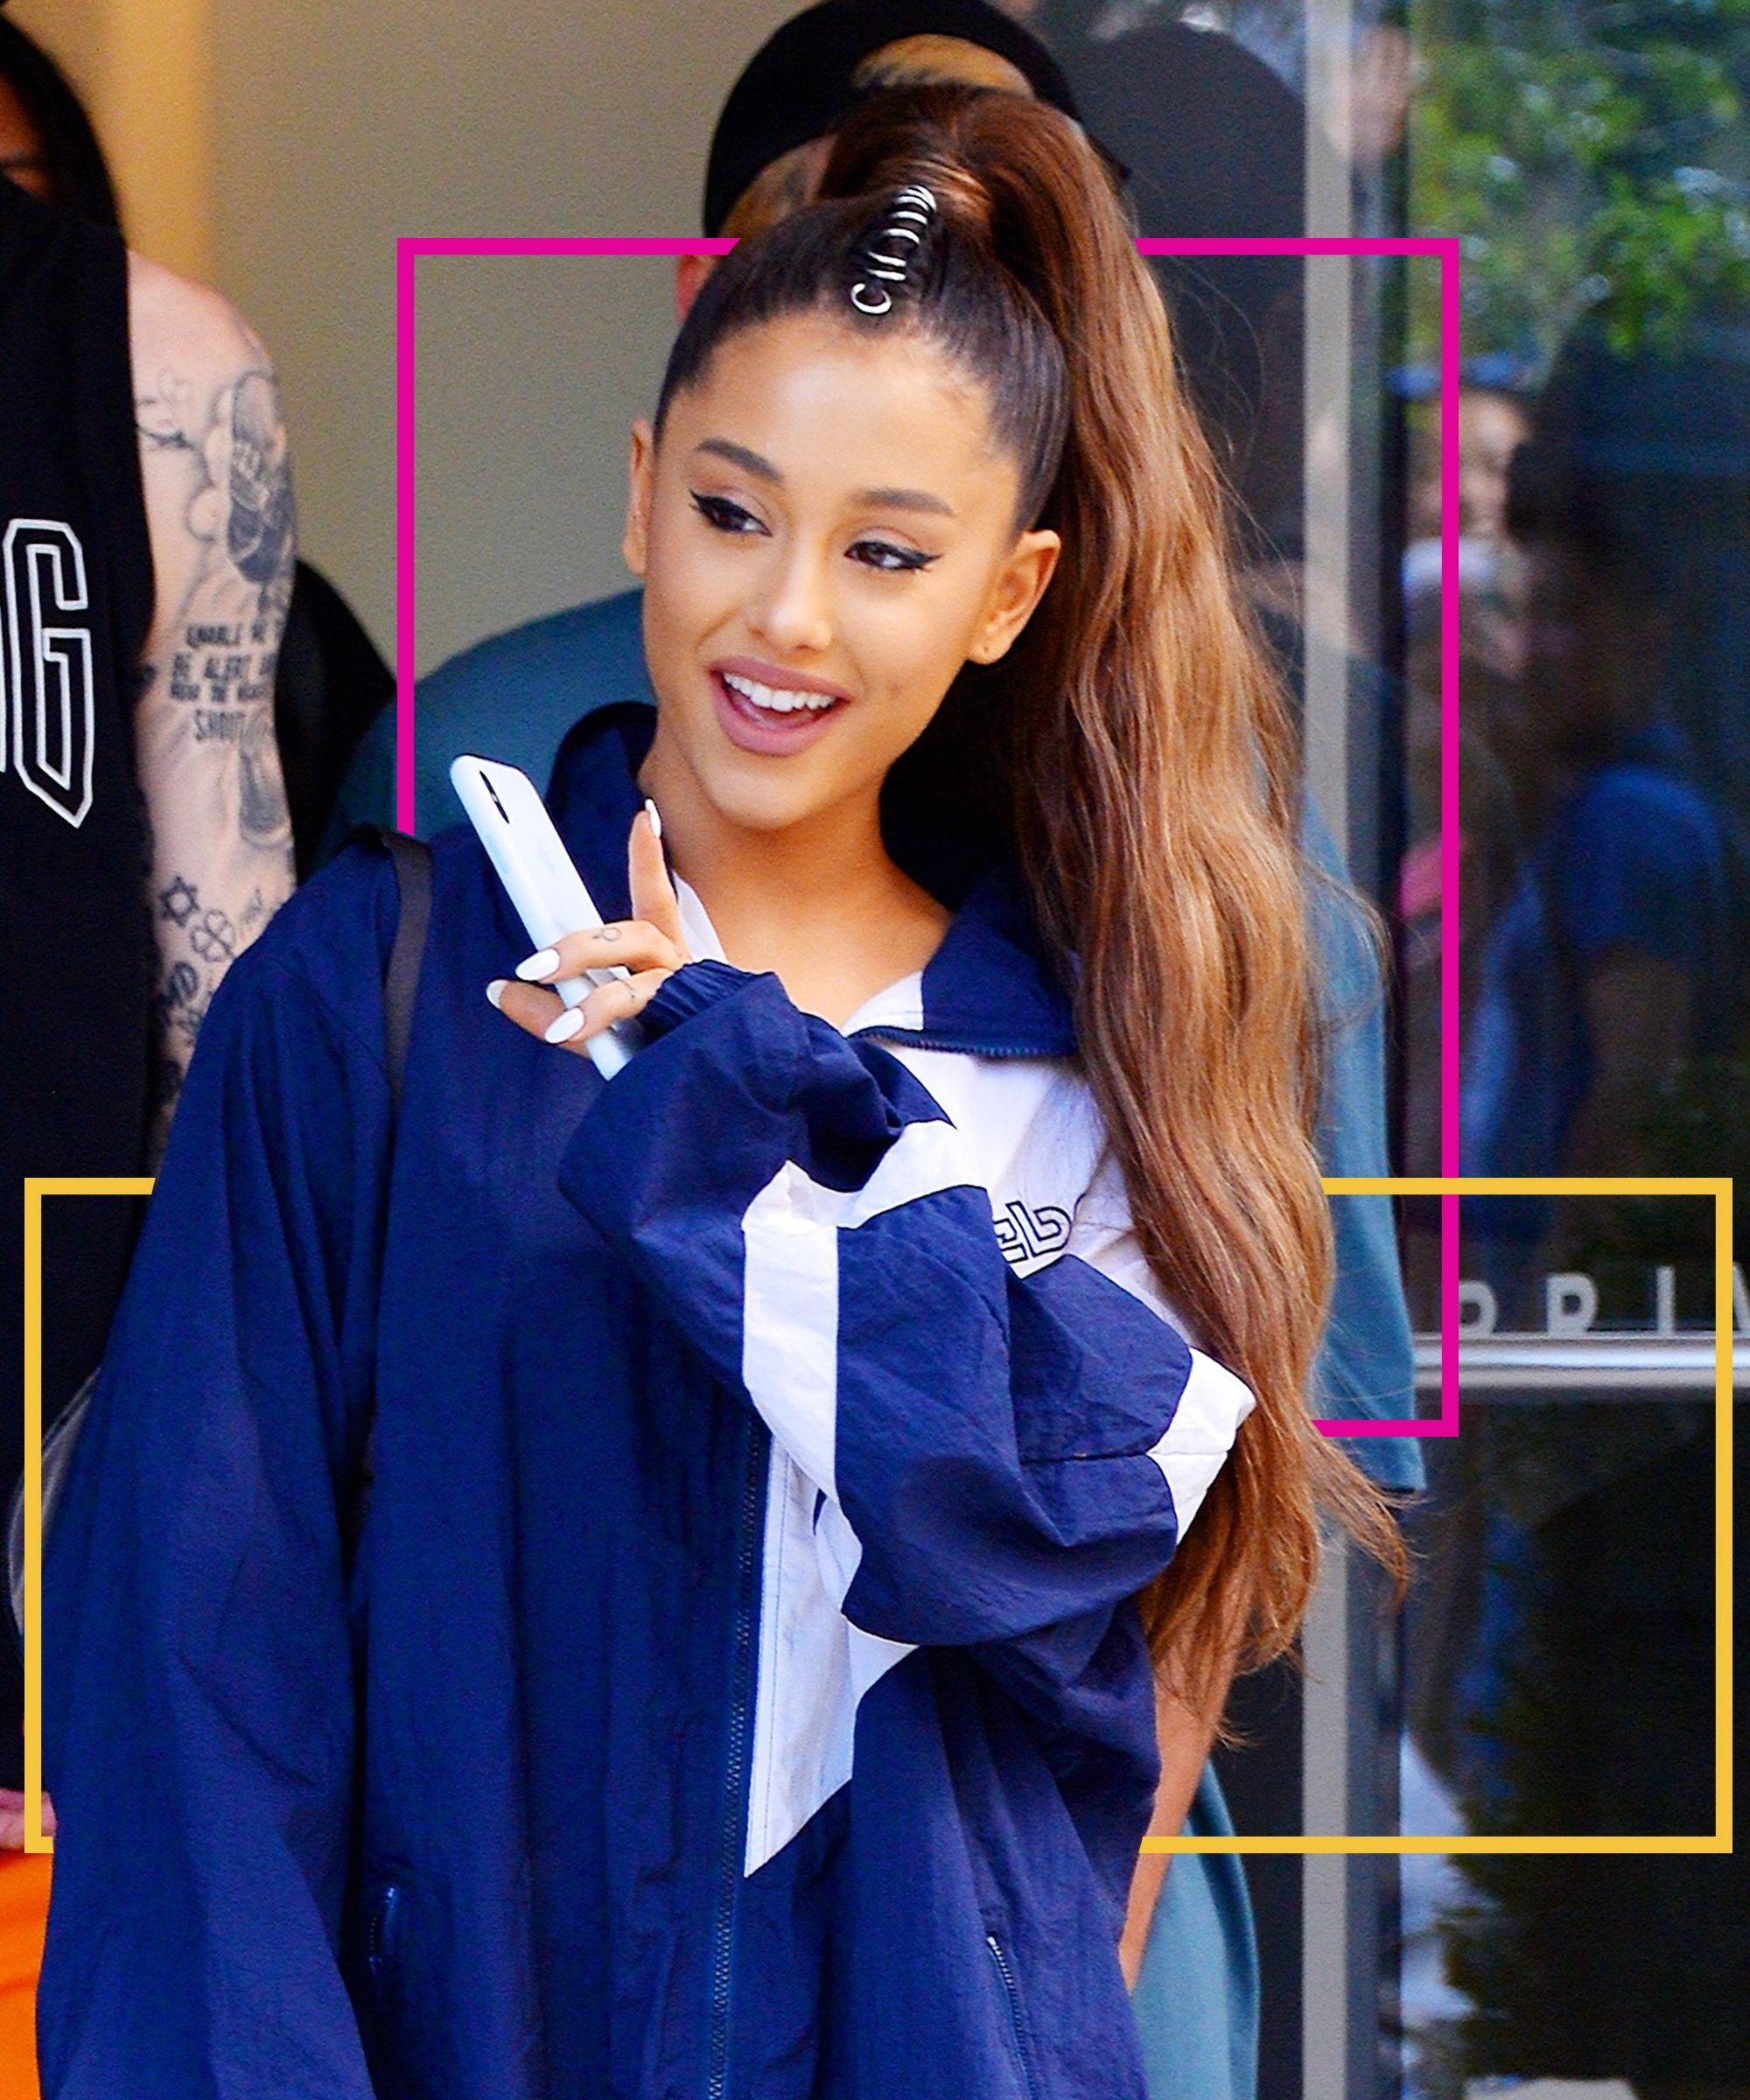 Pin On The Fashion Evolution Of Ariana Grande